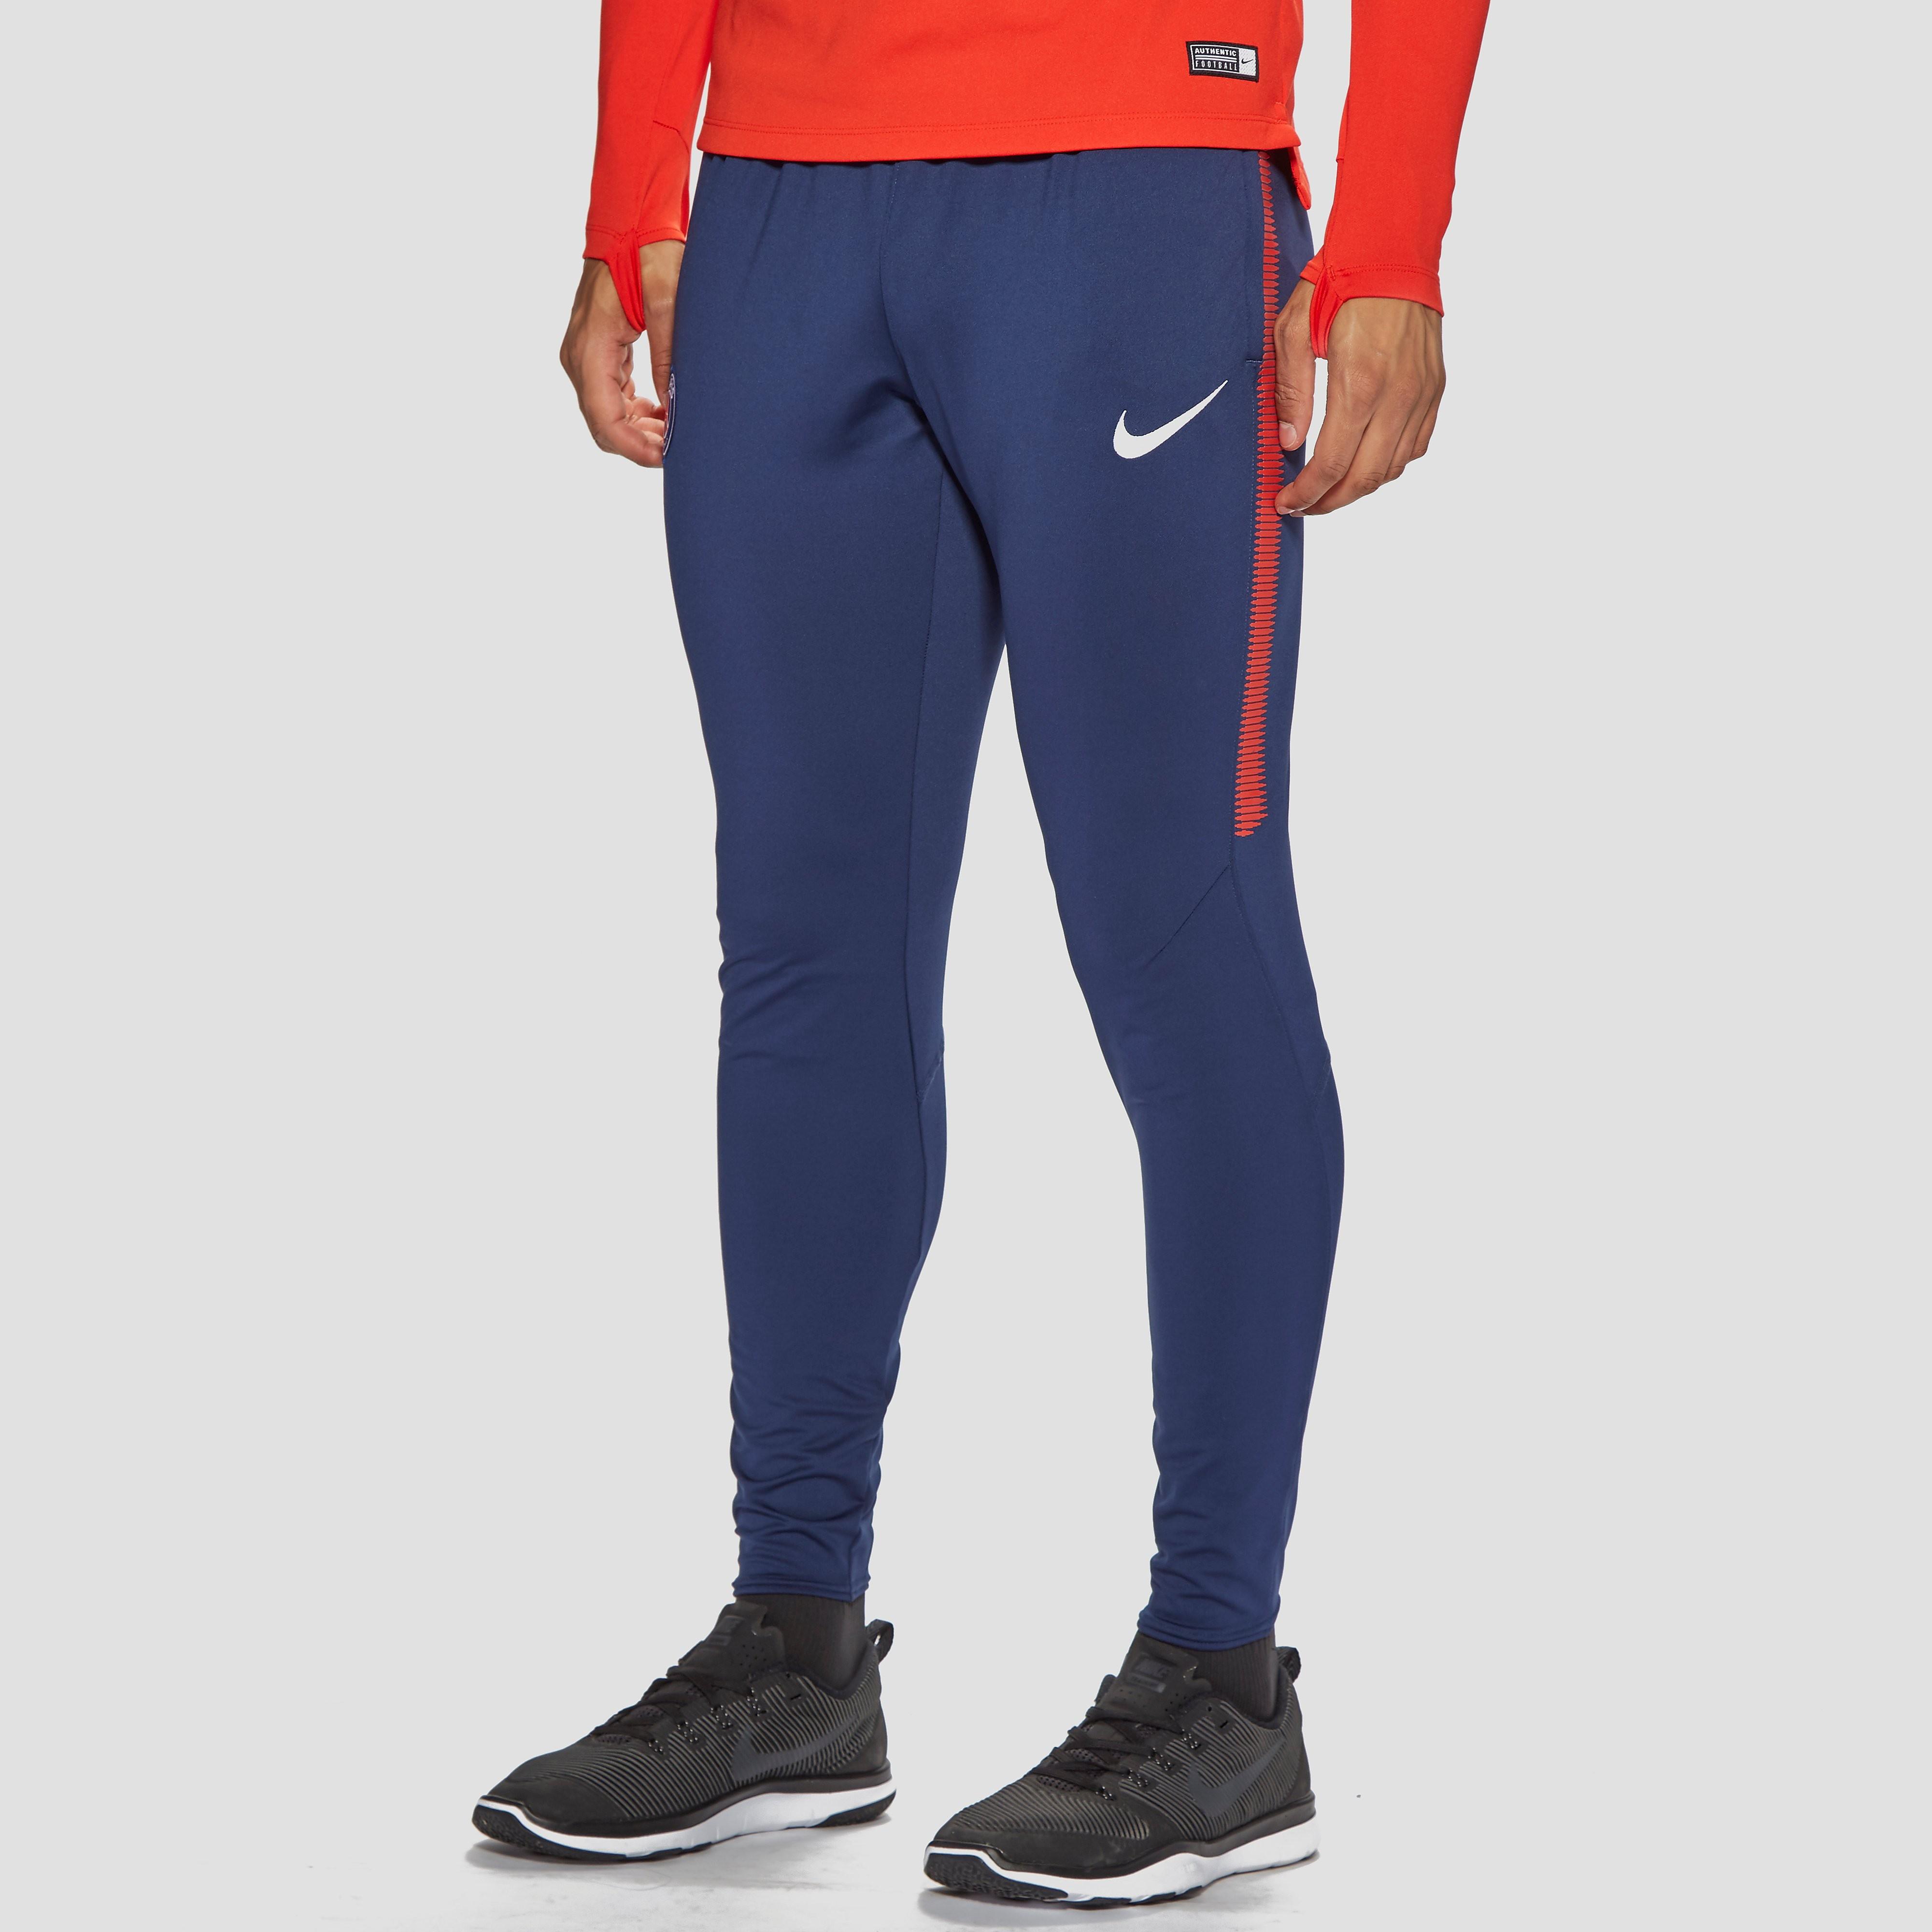 Nike Paris Saint Germain Men's Squad Pants